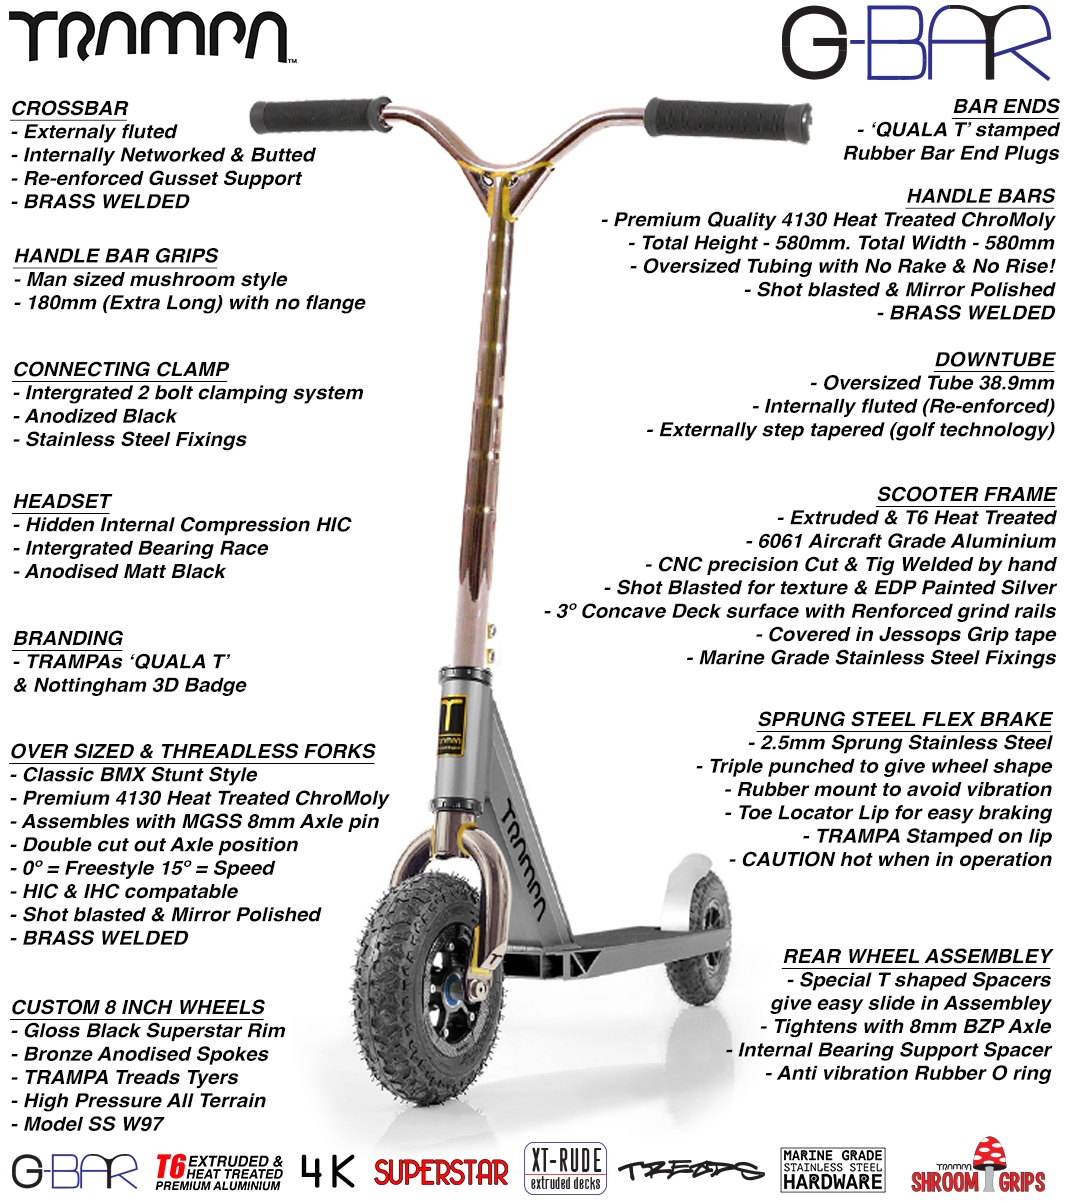 G-Bar Pro Scooters - BRASS WELDED 42CrMo4 Chromo Steel